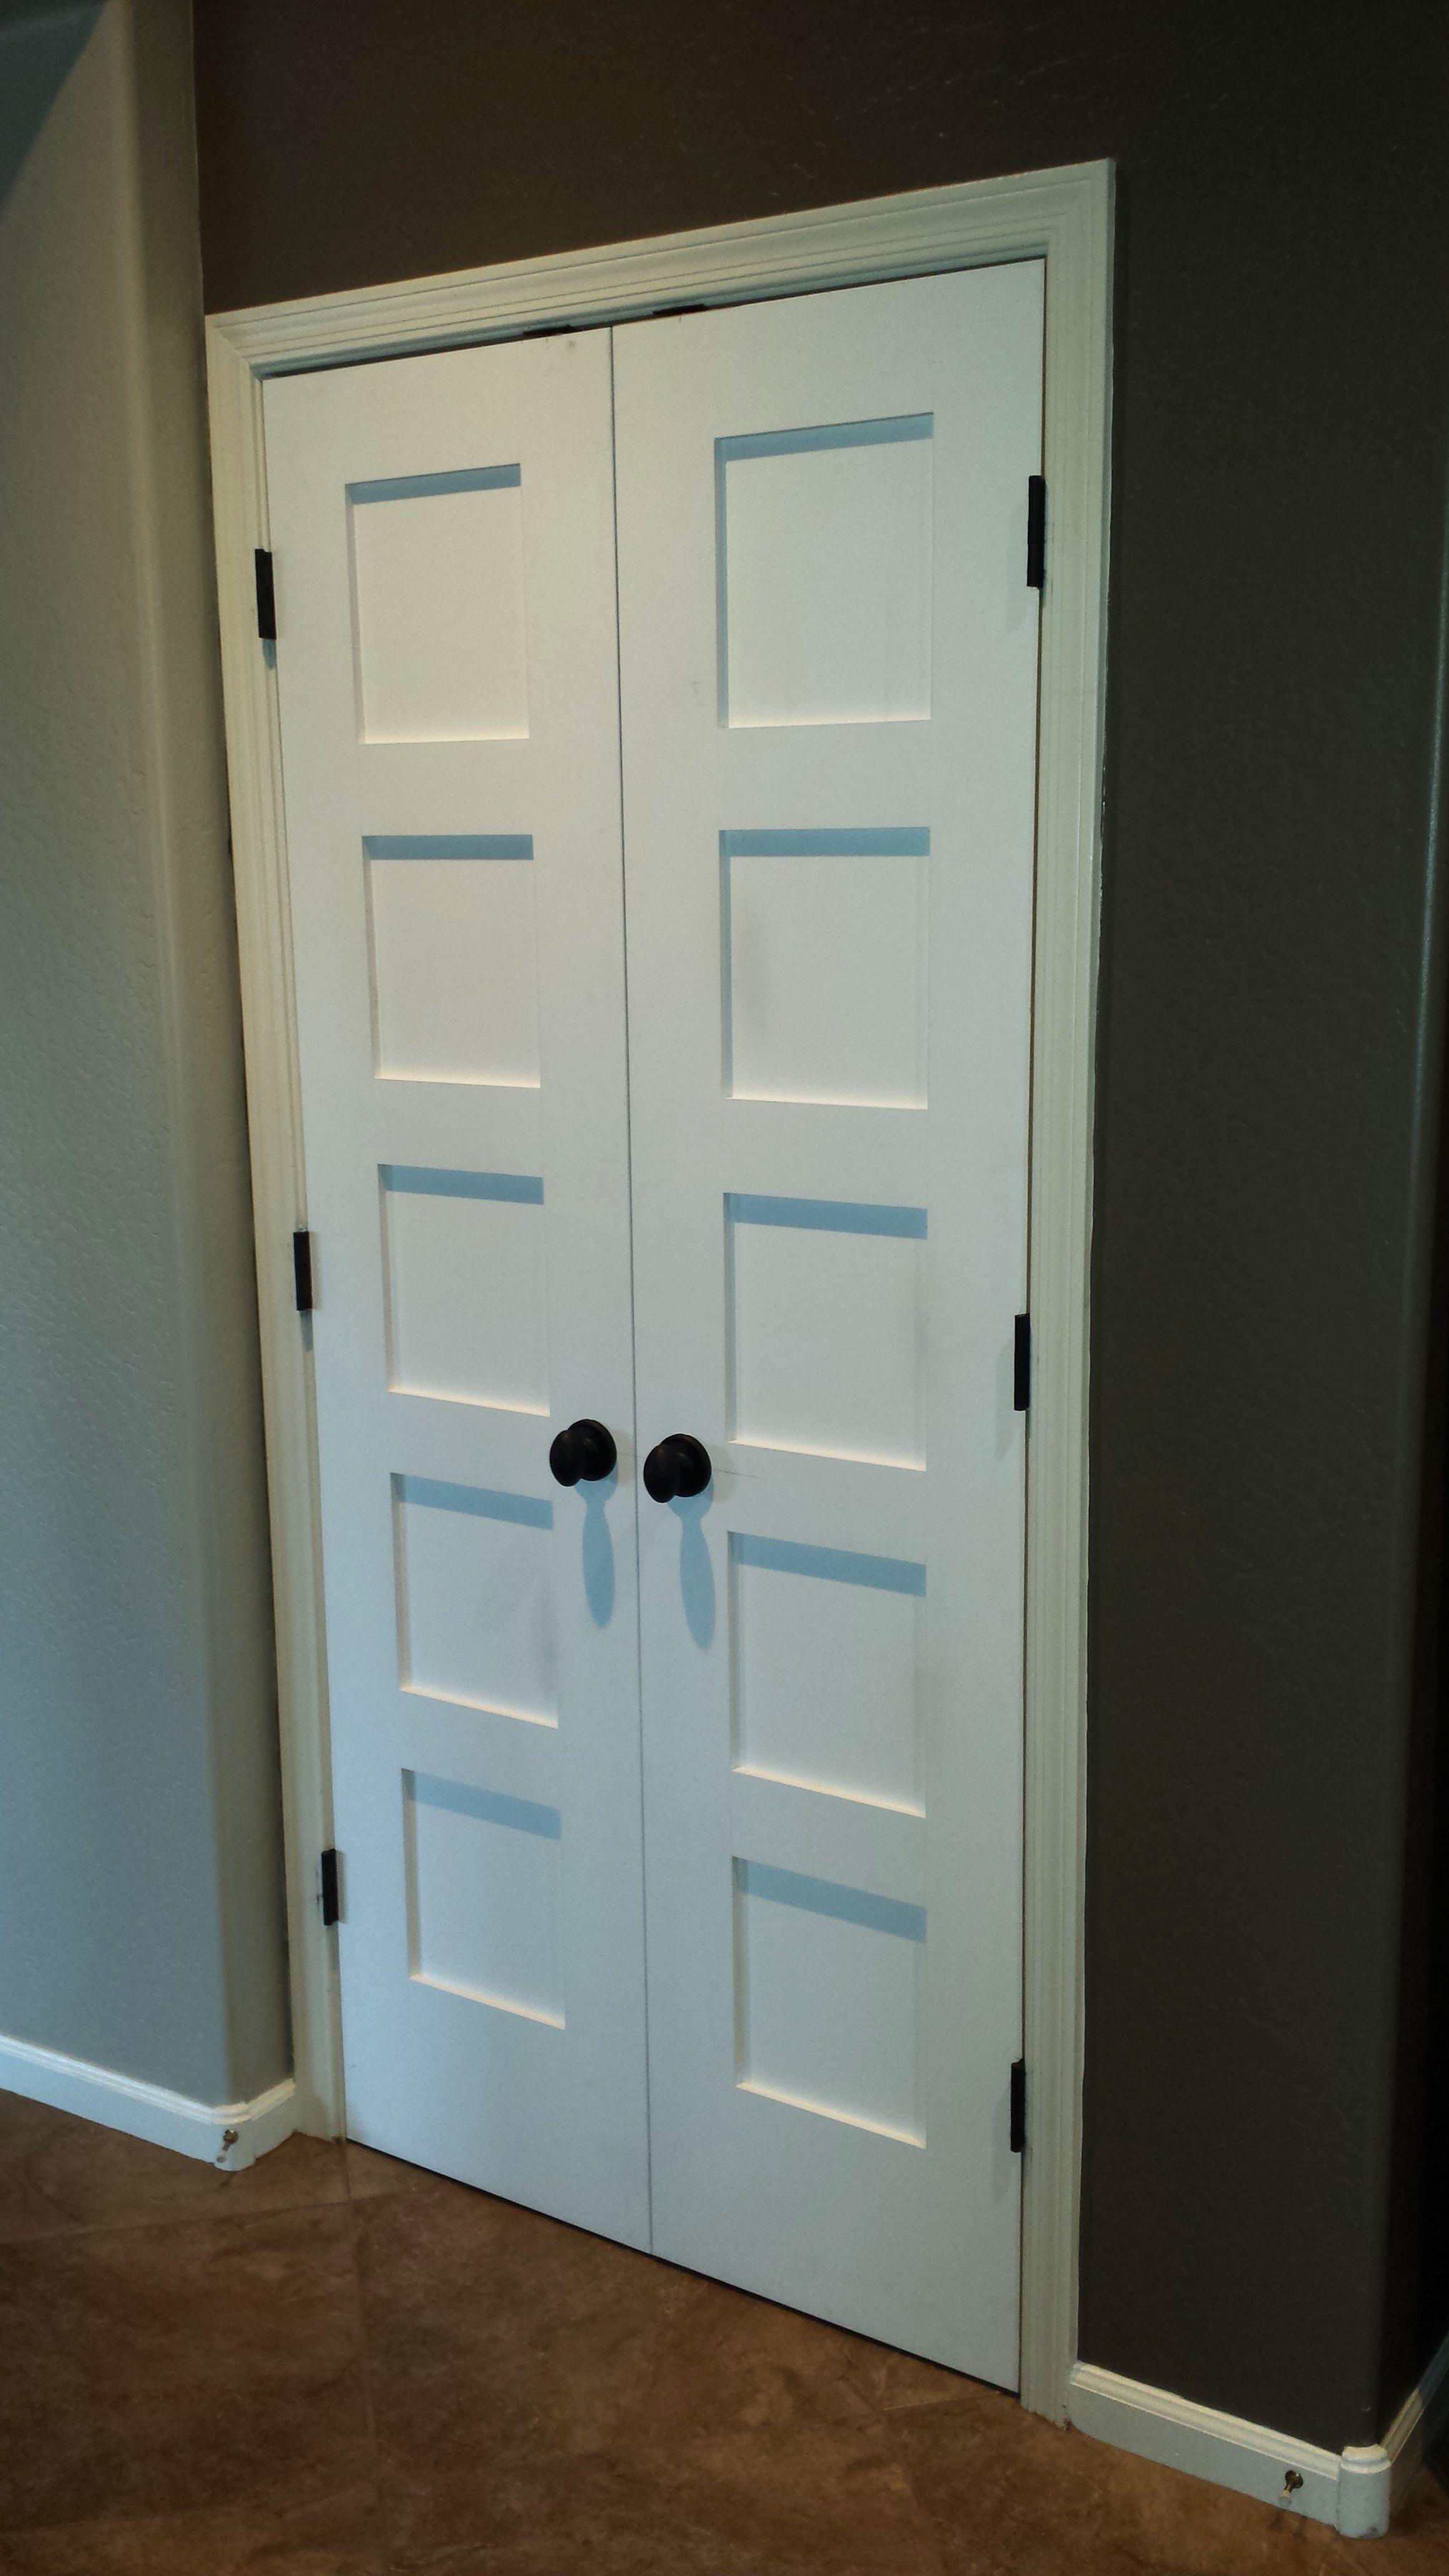 Interior Closet French Doors French closet doors, Double